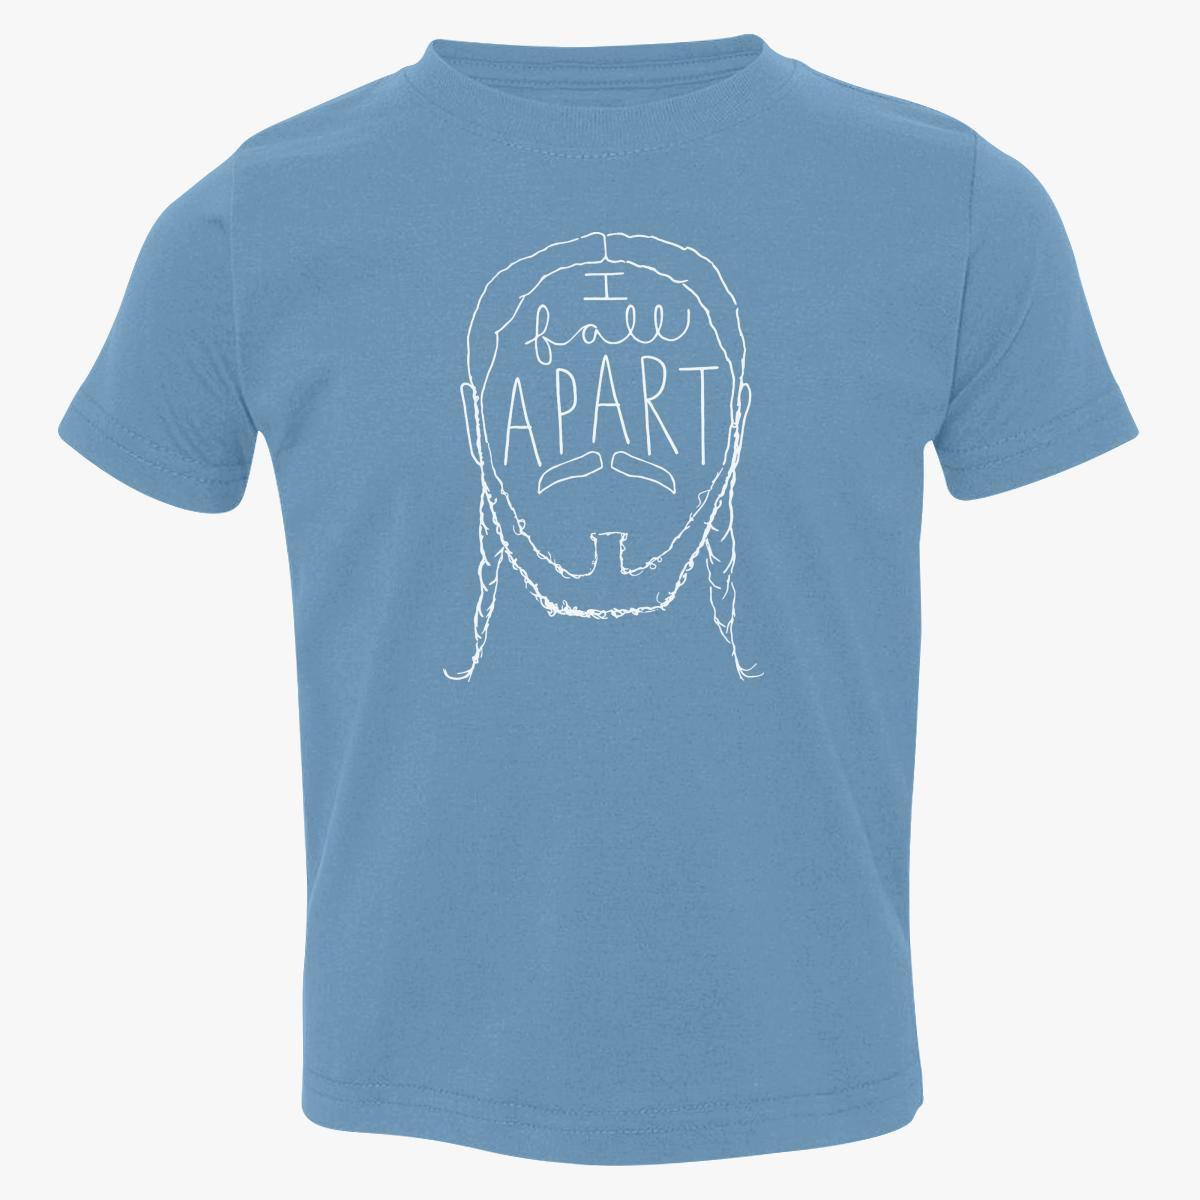 Post Malone I Fall Apart Guitar: Post Malone I Fall Apart Toddler T-shirt